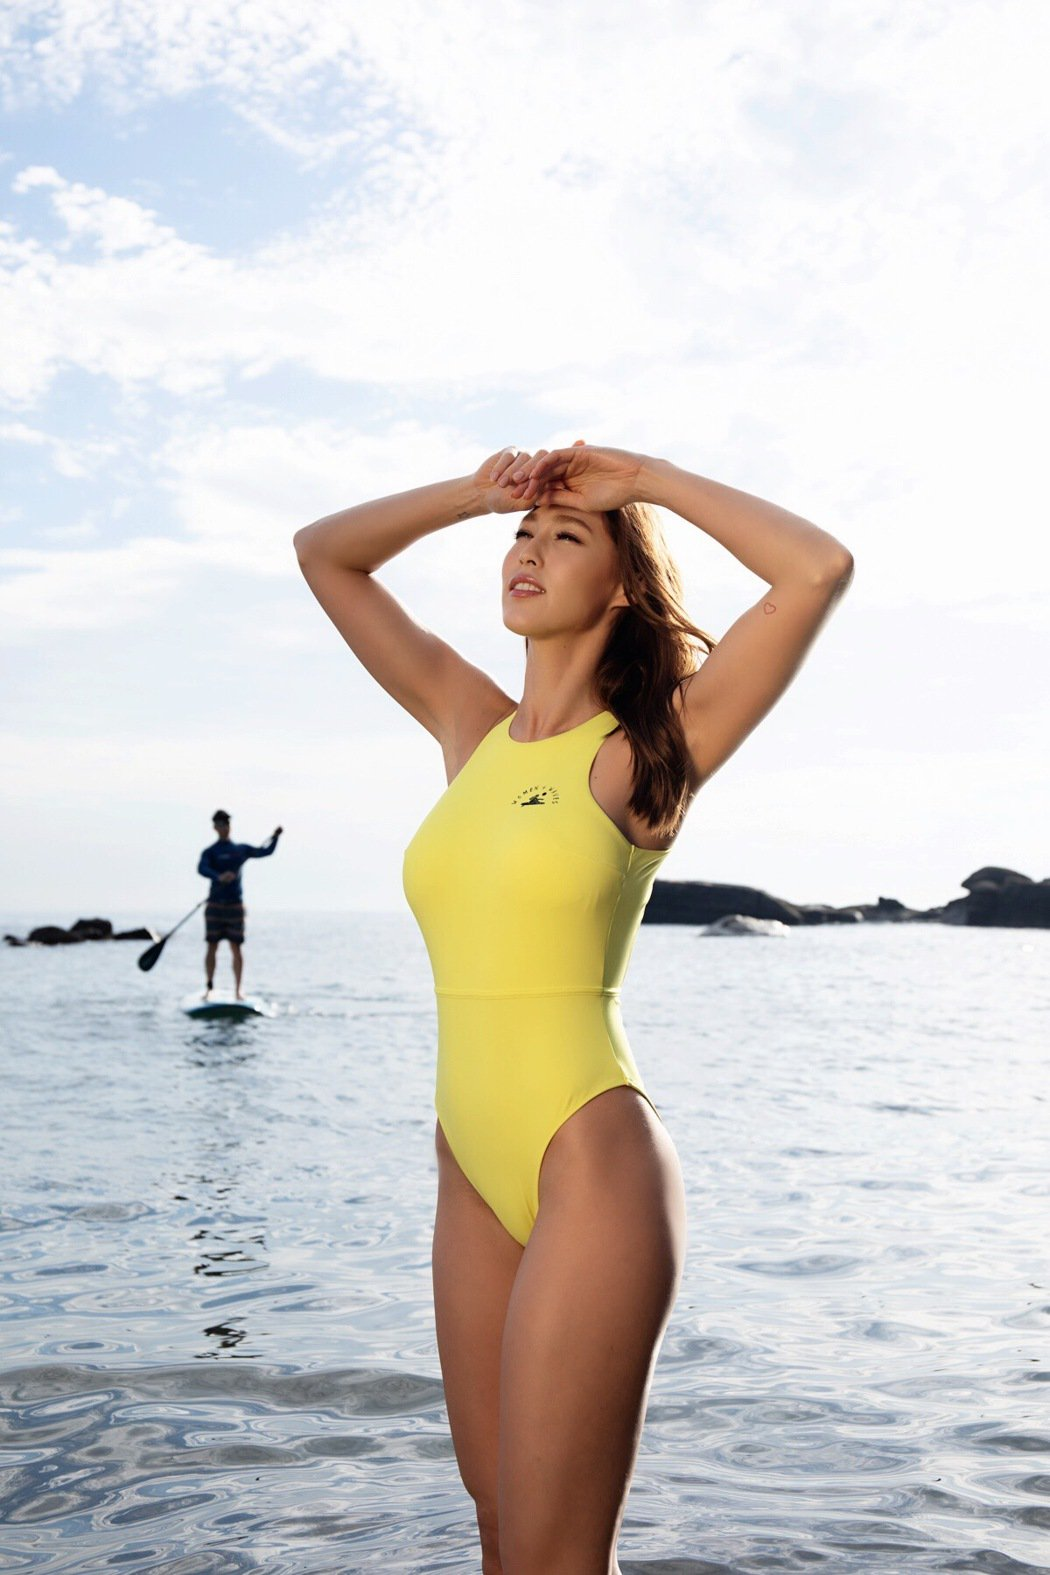 Akemi香月明美超健康美感身材,讓攝影師也忍不住驚嘆「amazing」!圖/ ...